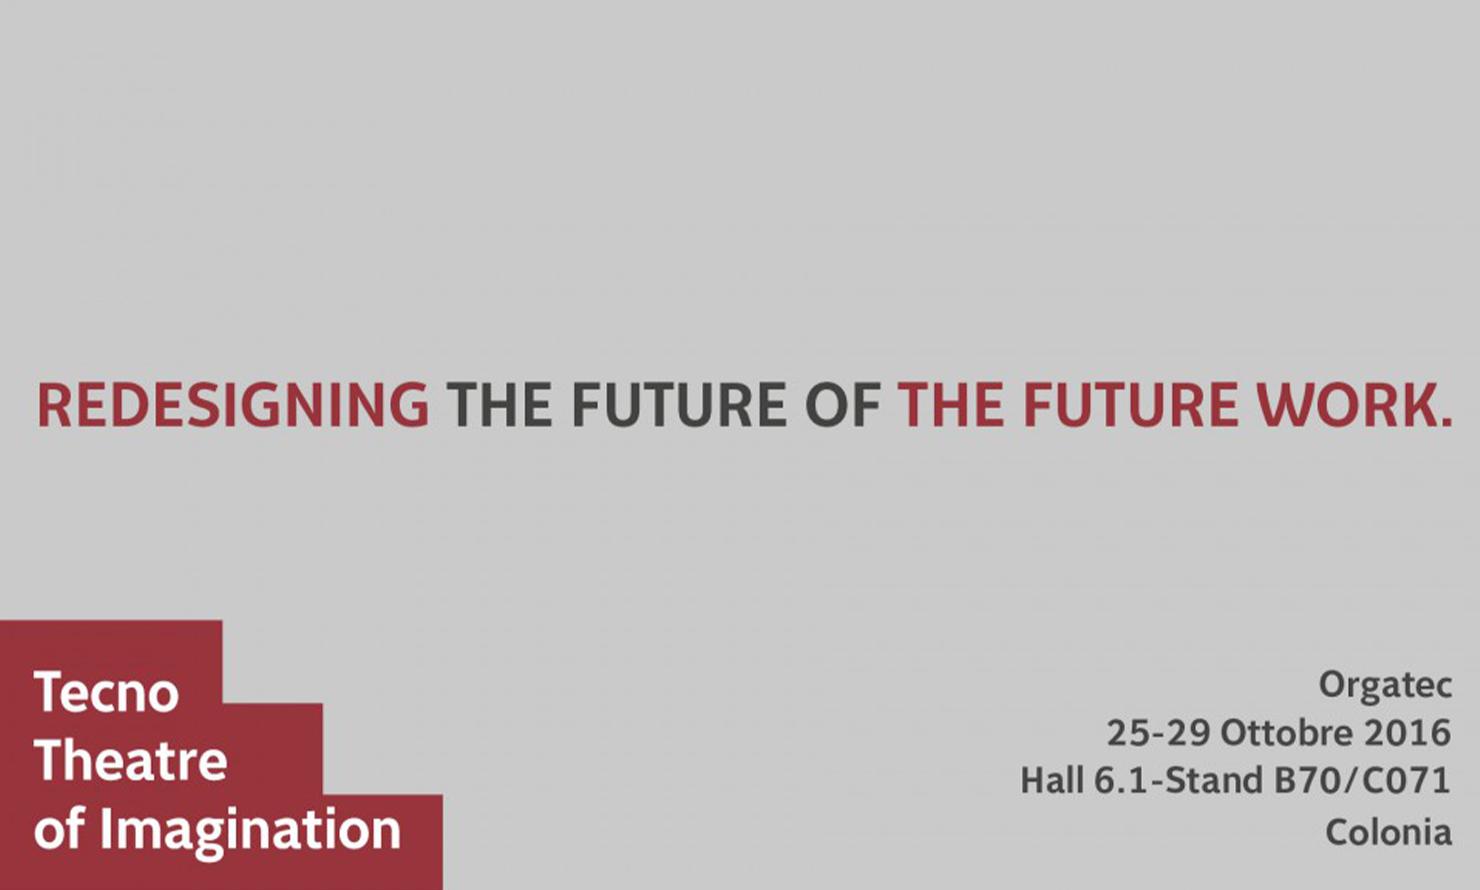 https://www.kubelibre.com/uploads/Slider-work-tutti-clienti/tecno-redesigning-the-future-of-the-future-of-work-12.jpg